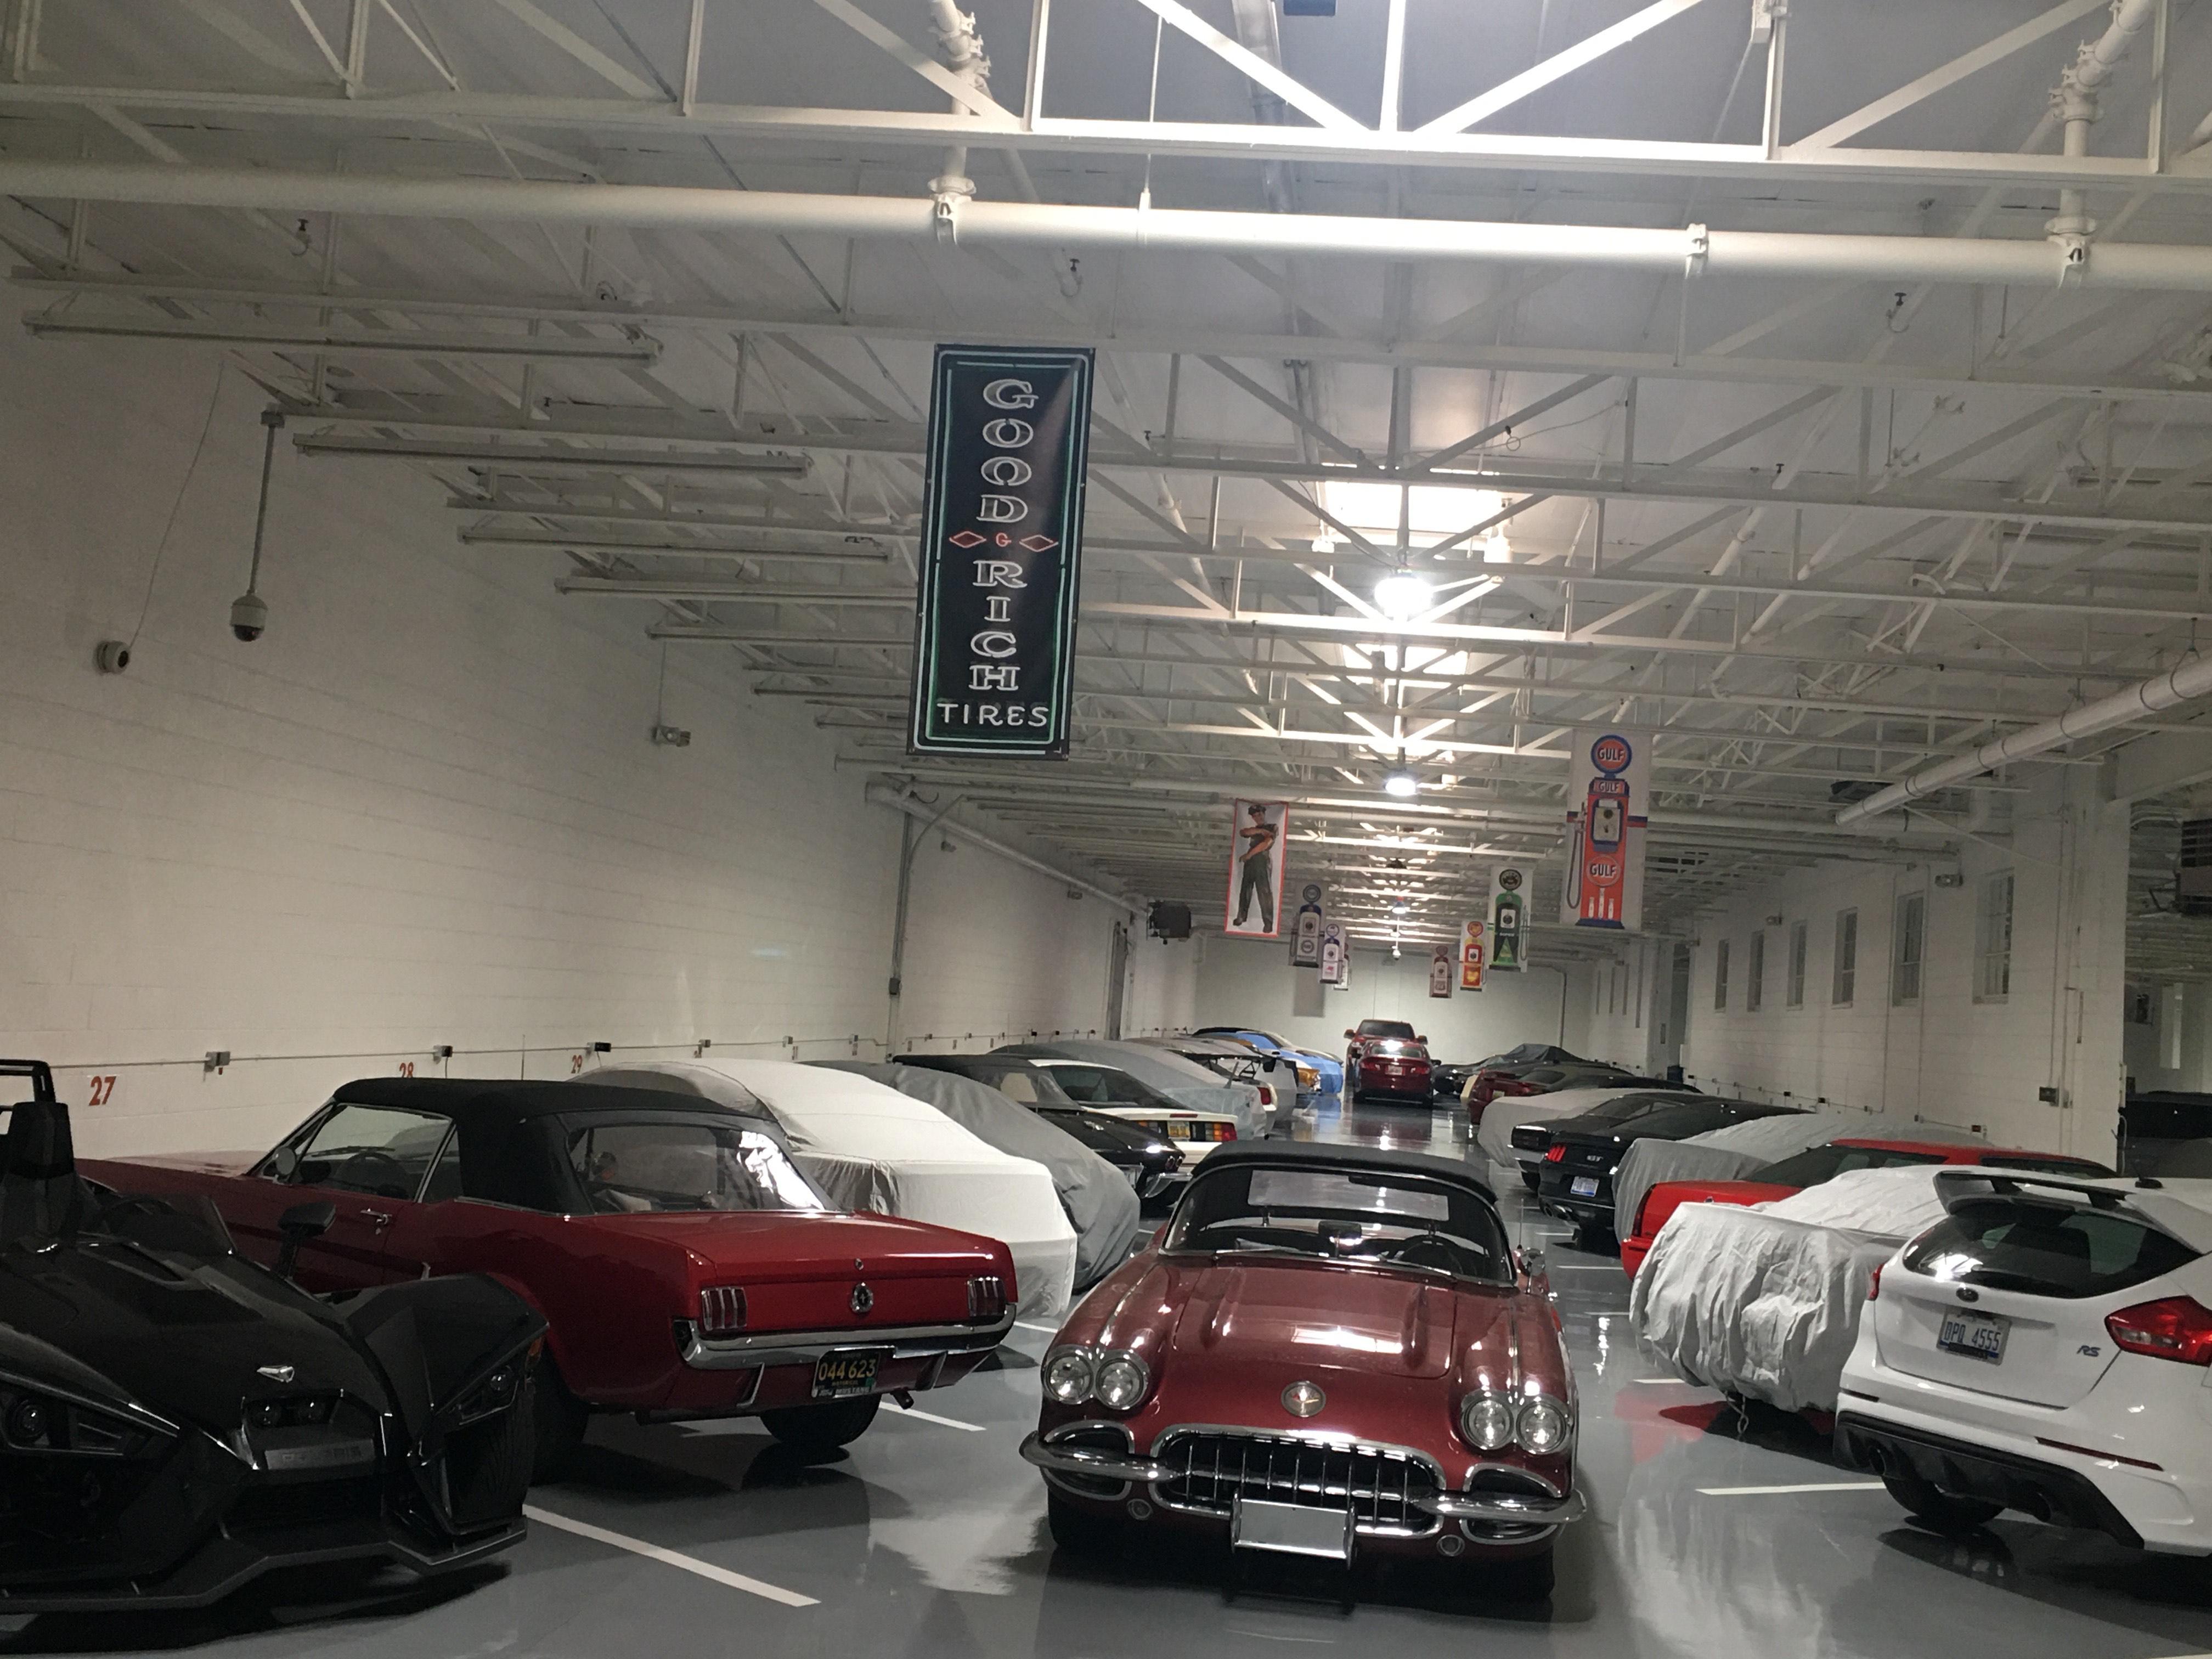 2020.02.15-17-Canton-Car-Cave-Cars-Coffee